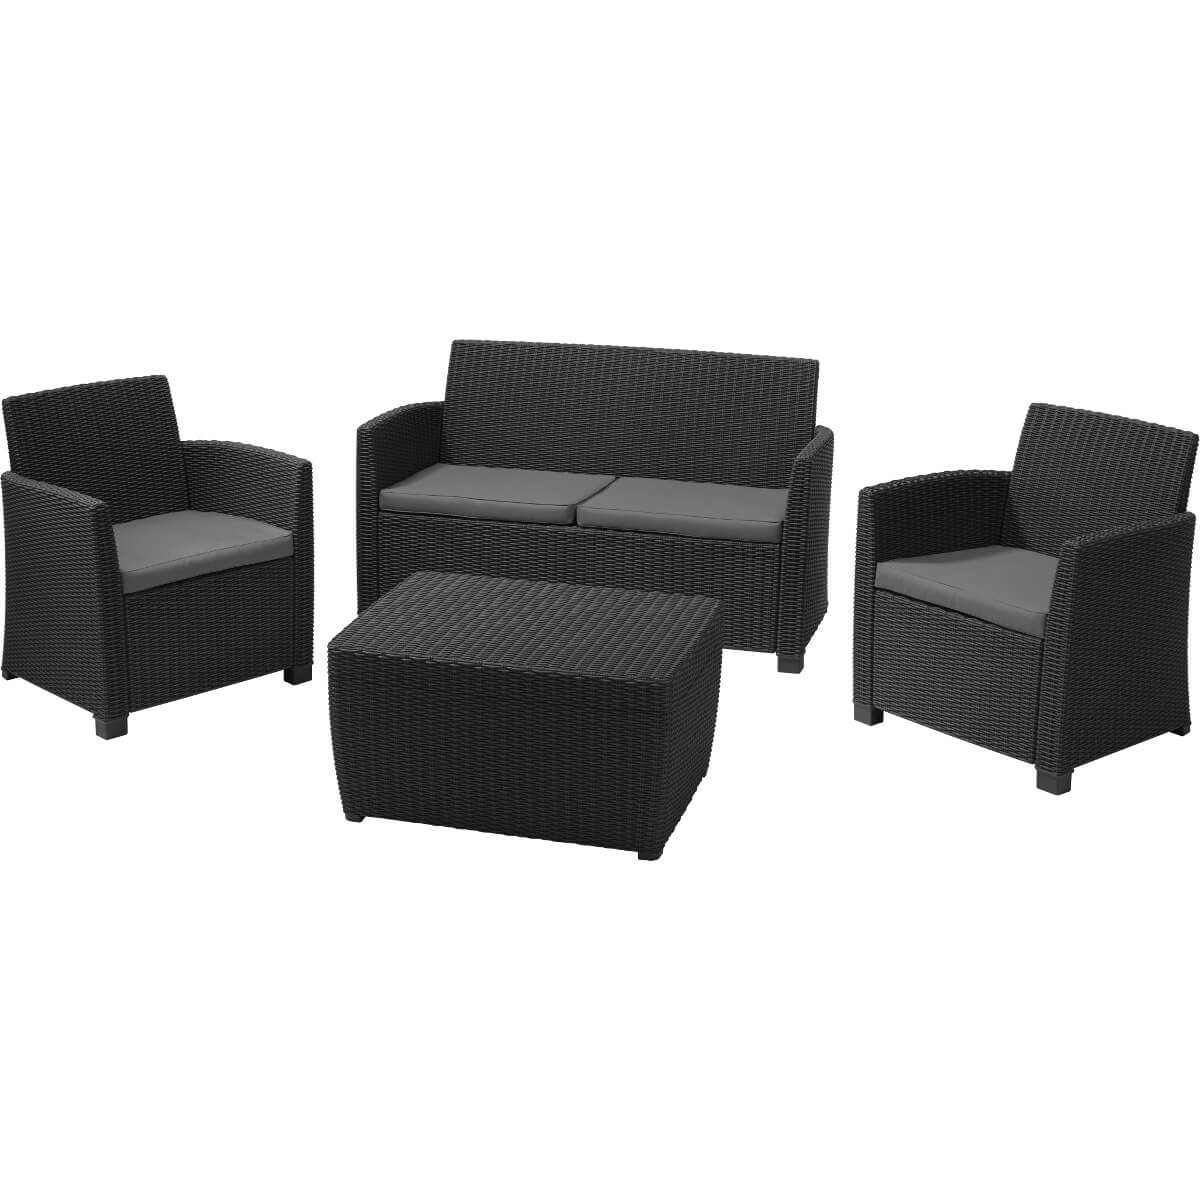 Комплект мебели Allibert Corfu Box 17200180